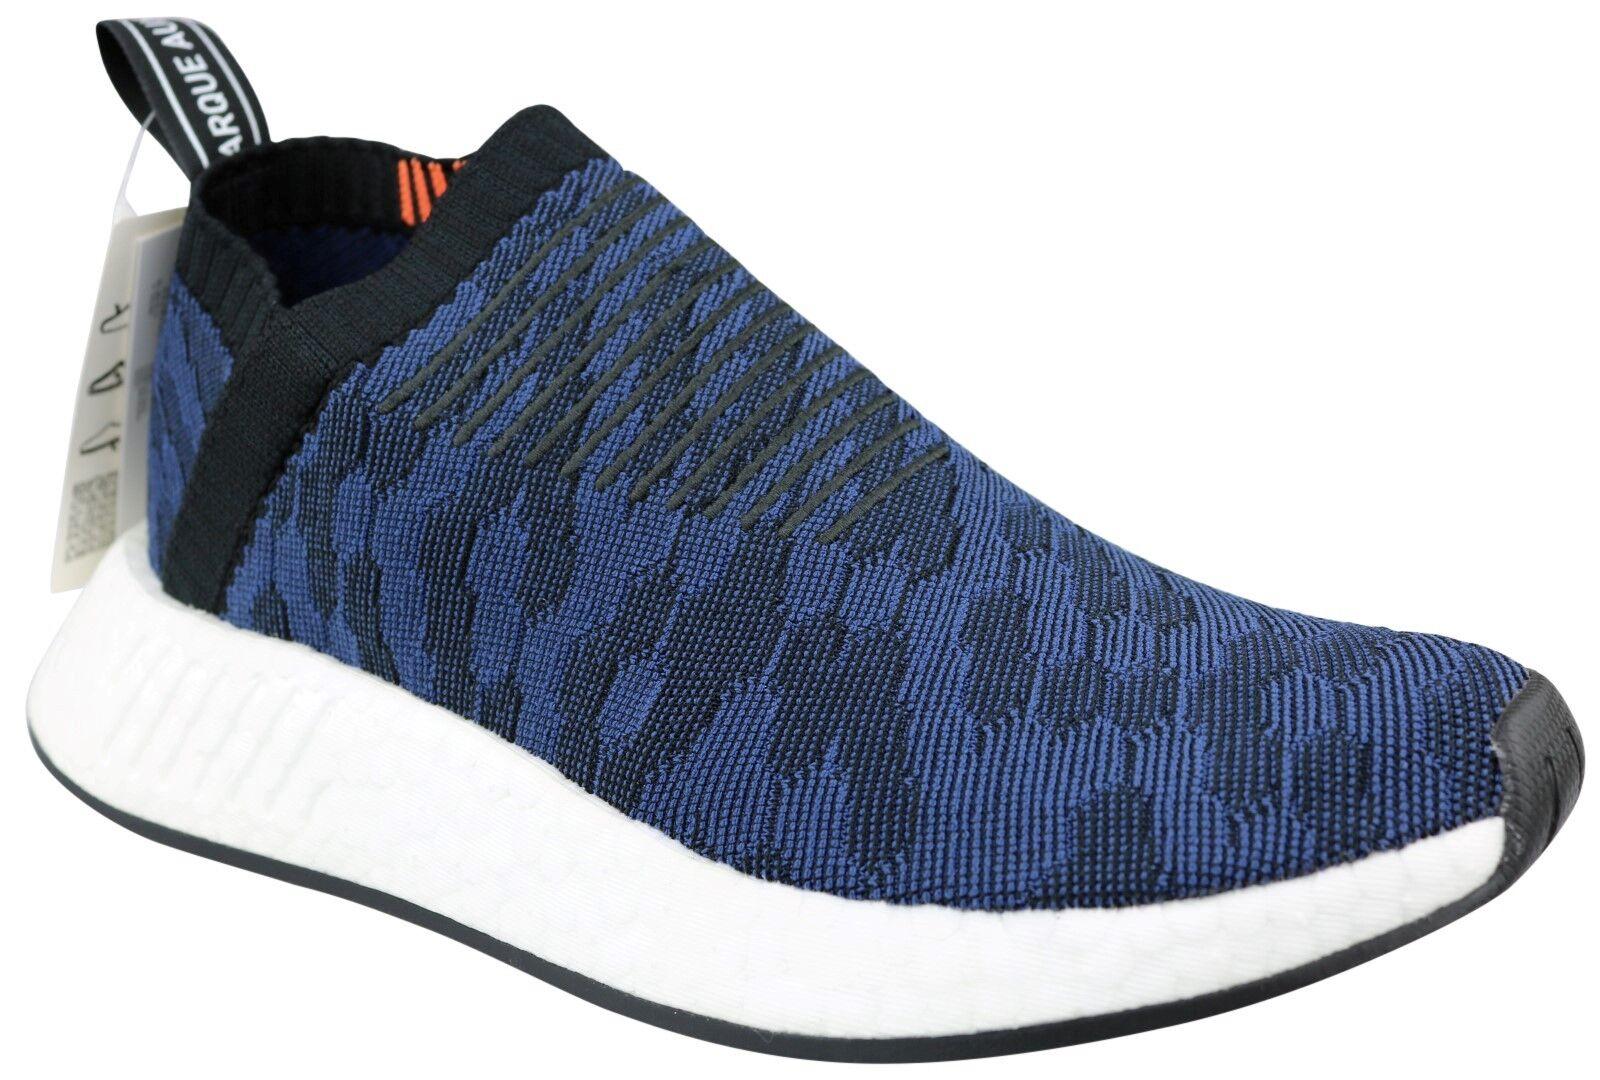 ADIDAS NMD CS2 PK W Primeknit Damen Sneaker - CQ2038 blau Gr. 36 - Sneaker 42 NEU & OVP 59669c